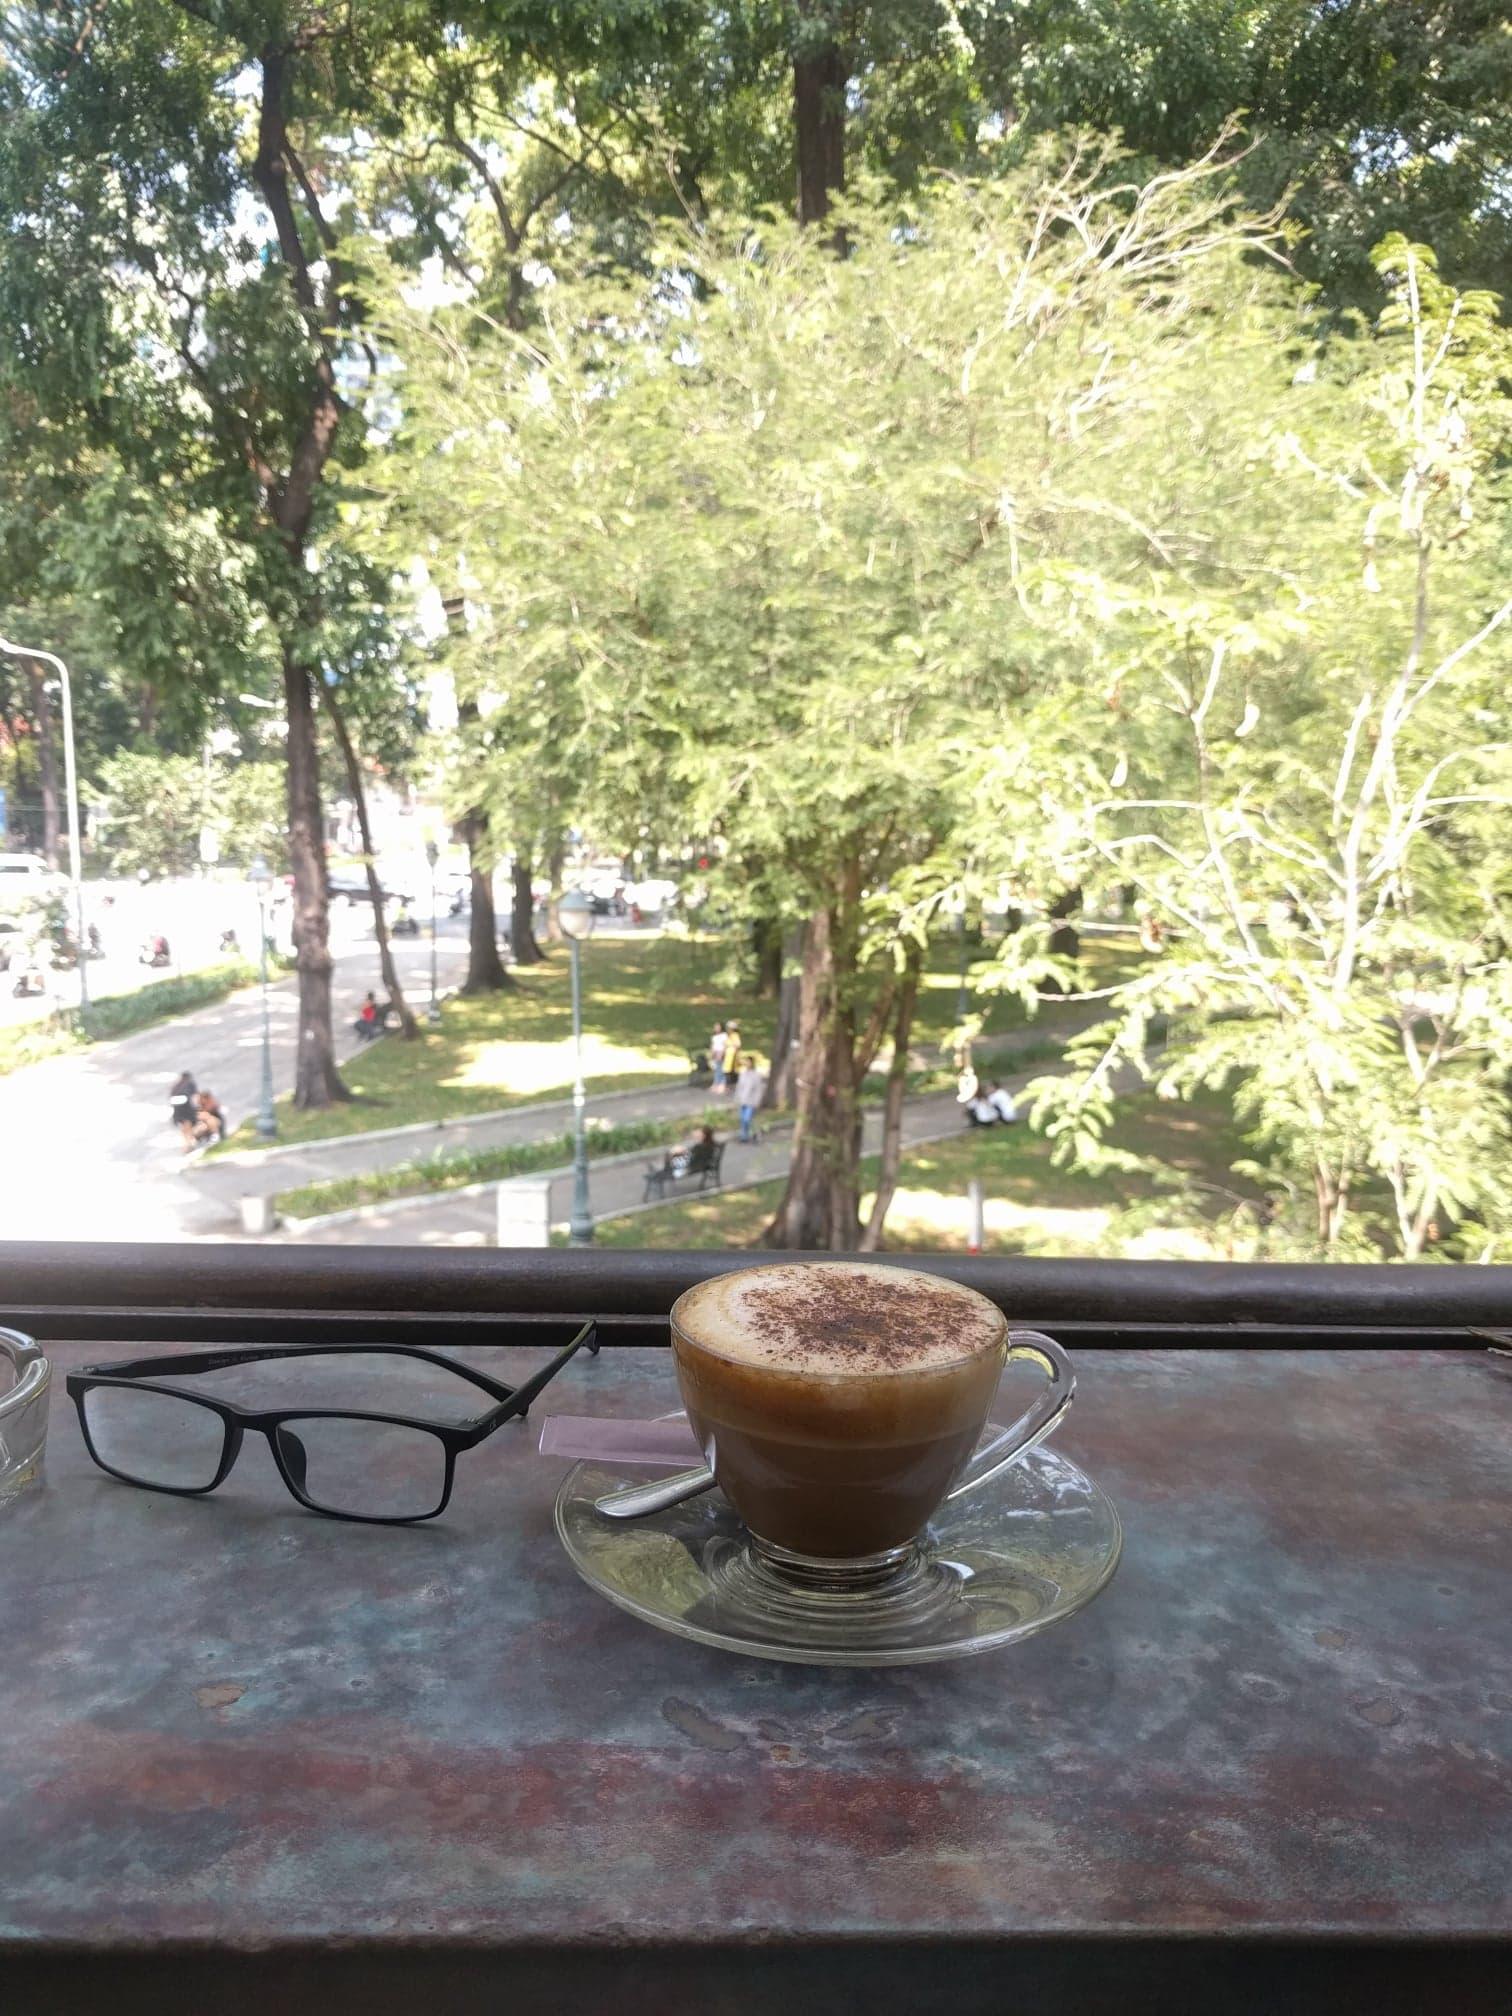 Backpacking in Saigon to enjoy good coffee